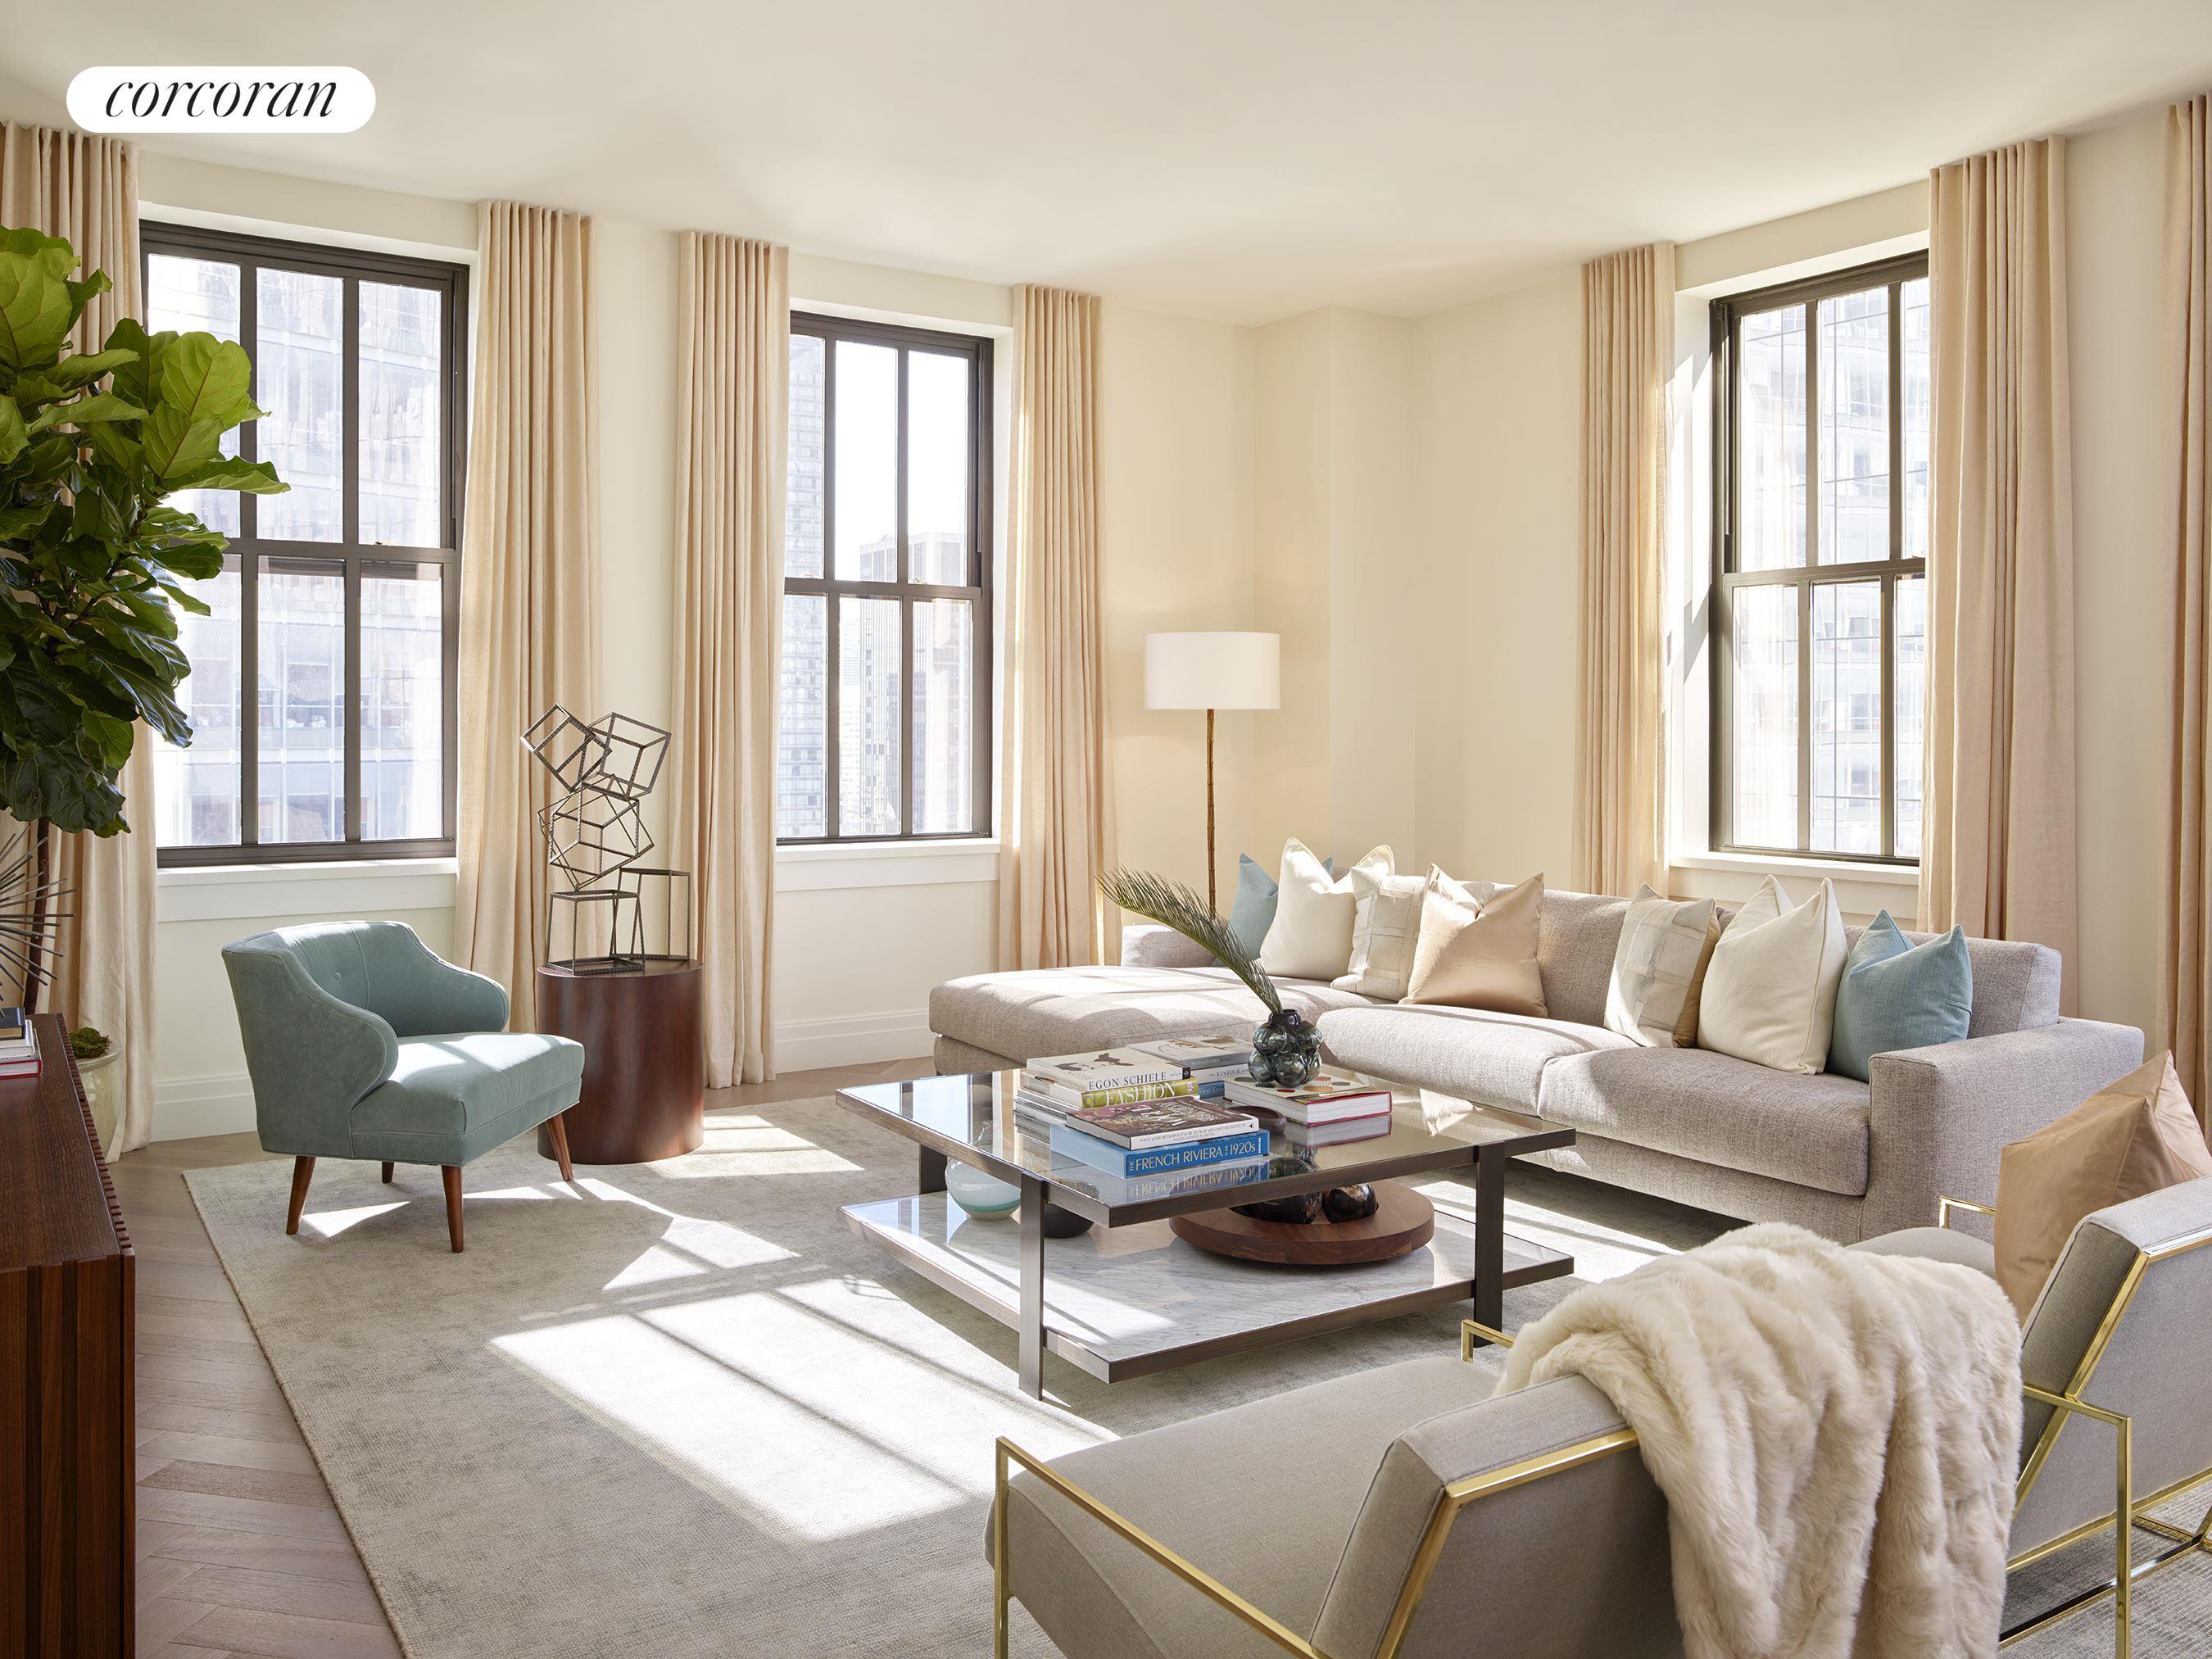 Corcoran, 100 BARCLAY ST, Apt. 22C, Tribeca Real Estate, Manhattan ...